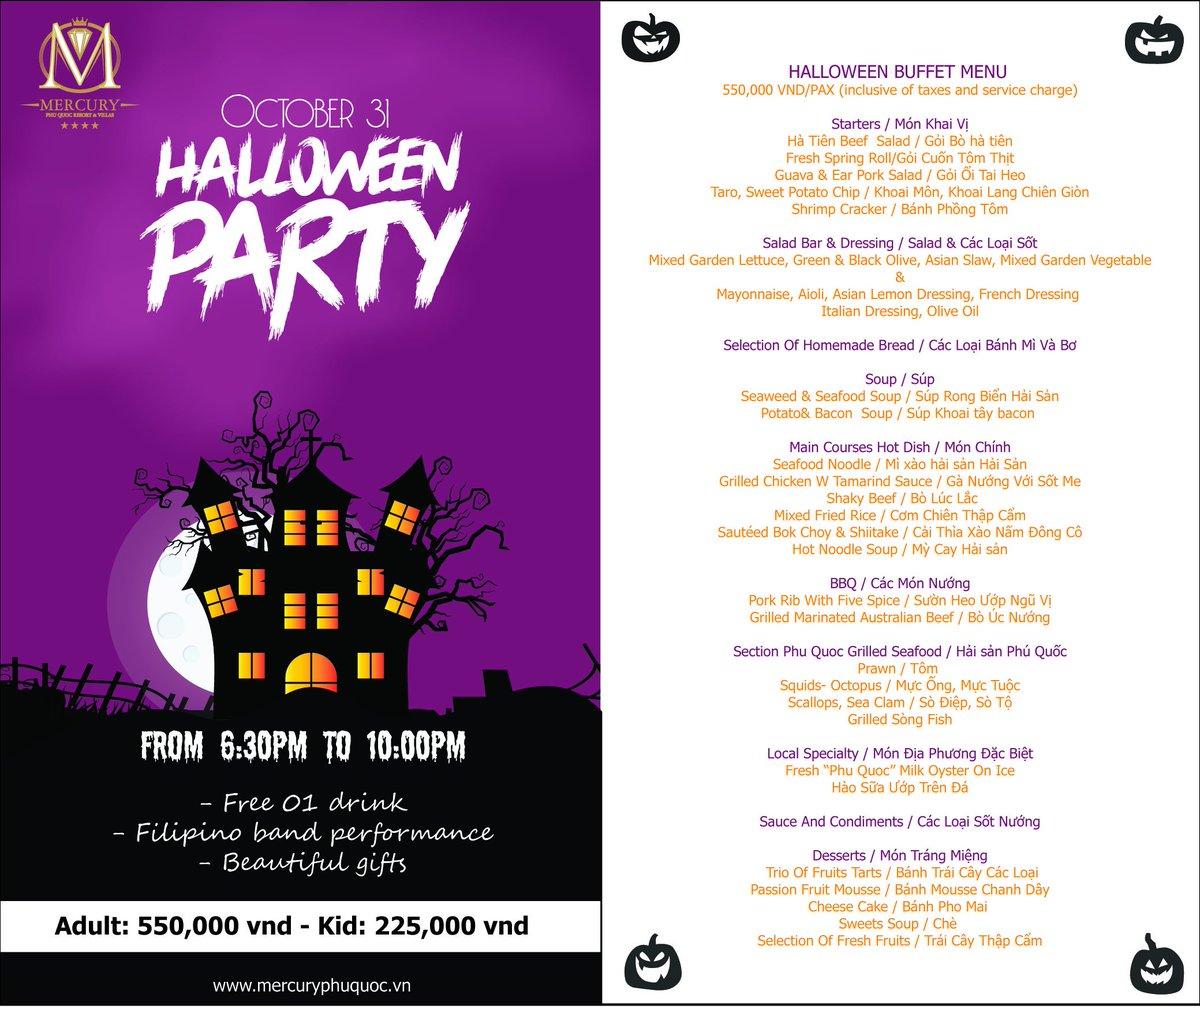 #Halloweenparty at #mercuryphuquocresortandvillas Please join us. https://t.co/zWJvTV2N9r